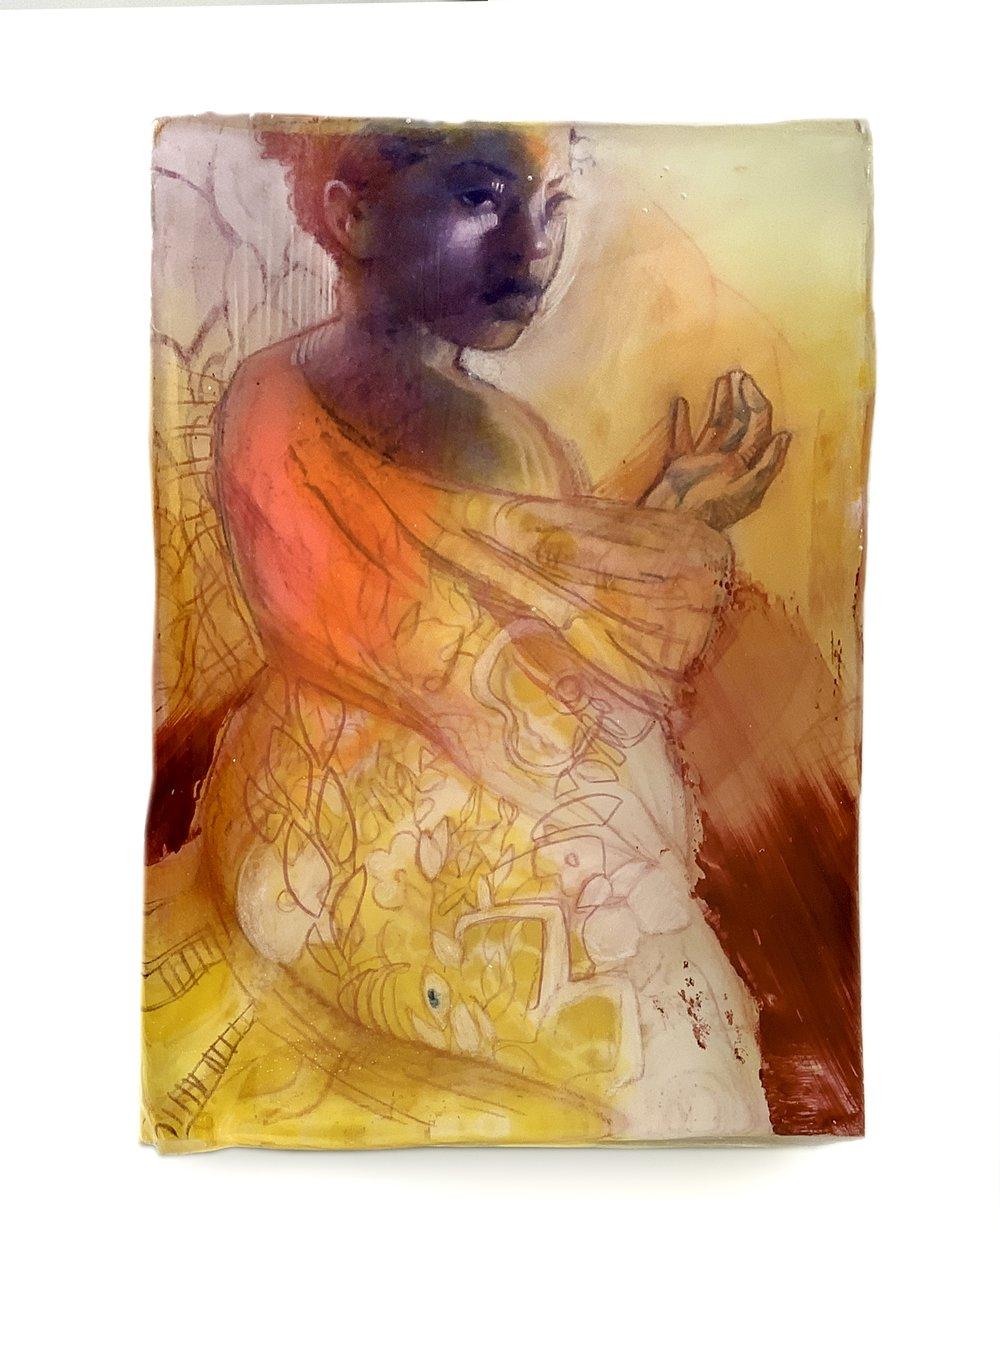 Marc Scheff - Lightness - Mixed Media and ArtResin - 5x7x3 - 2019 - $775  - side view.jpg